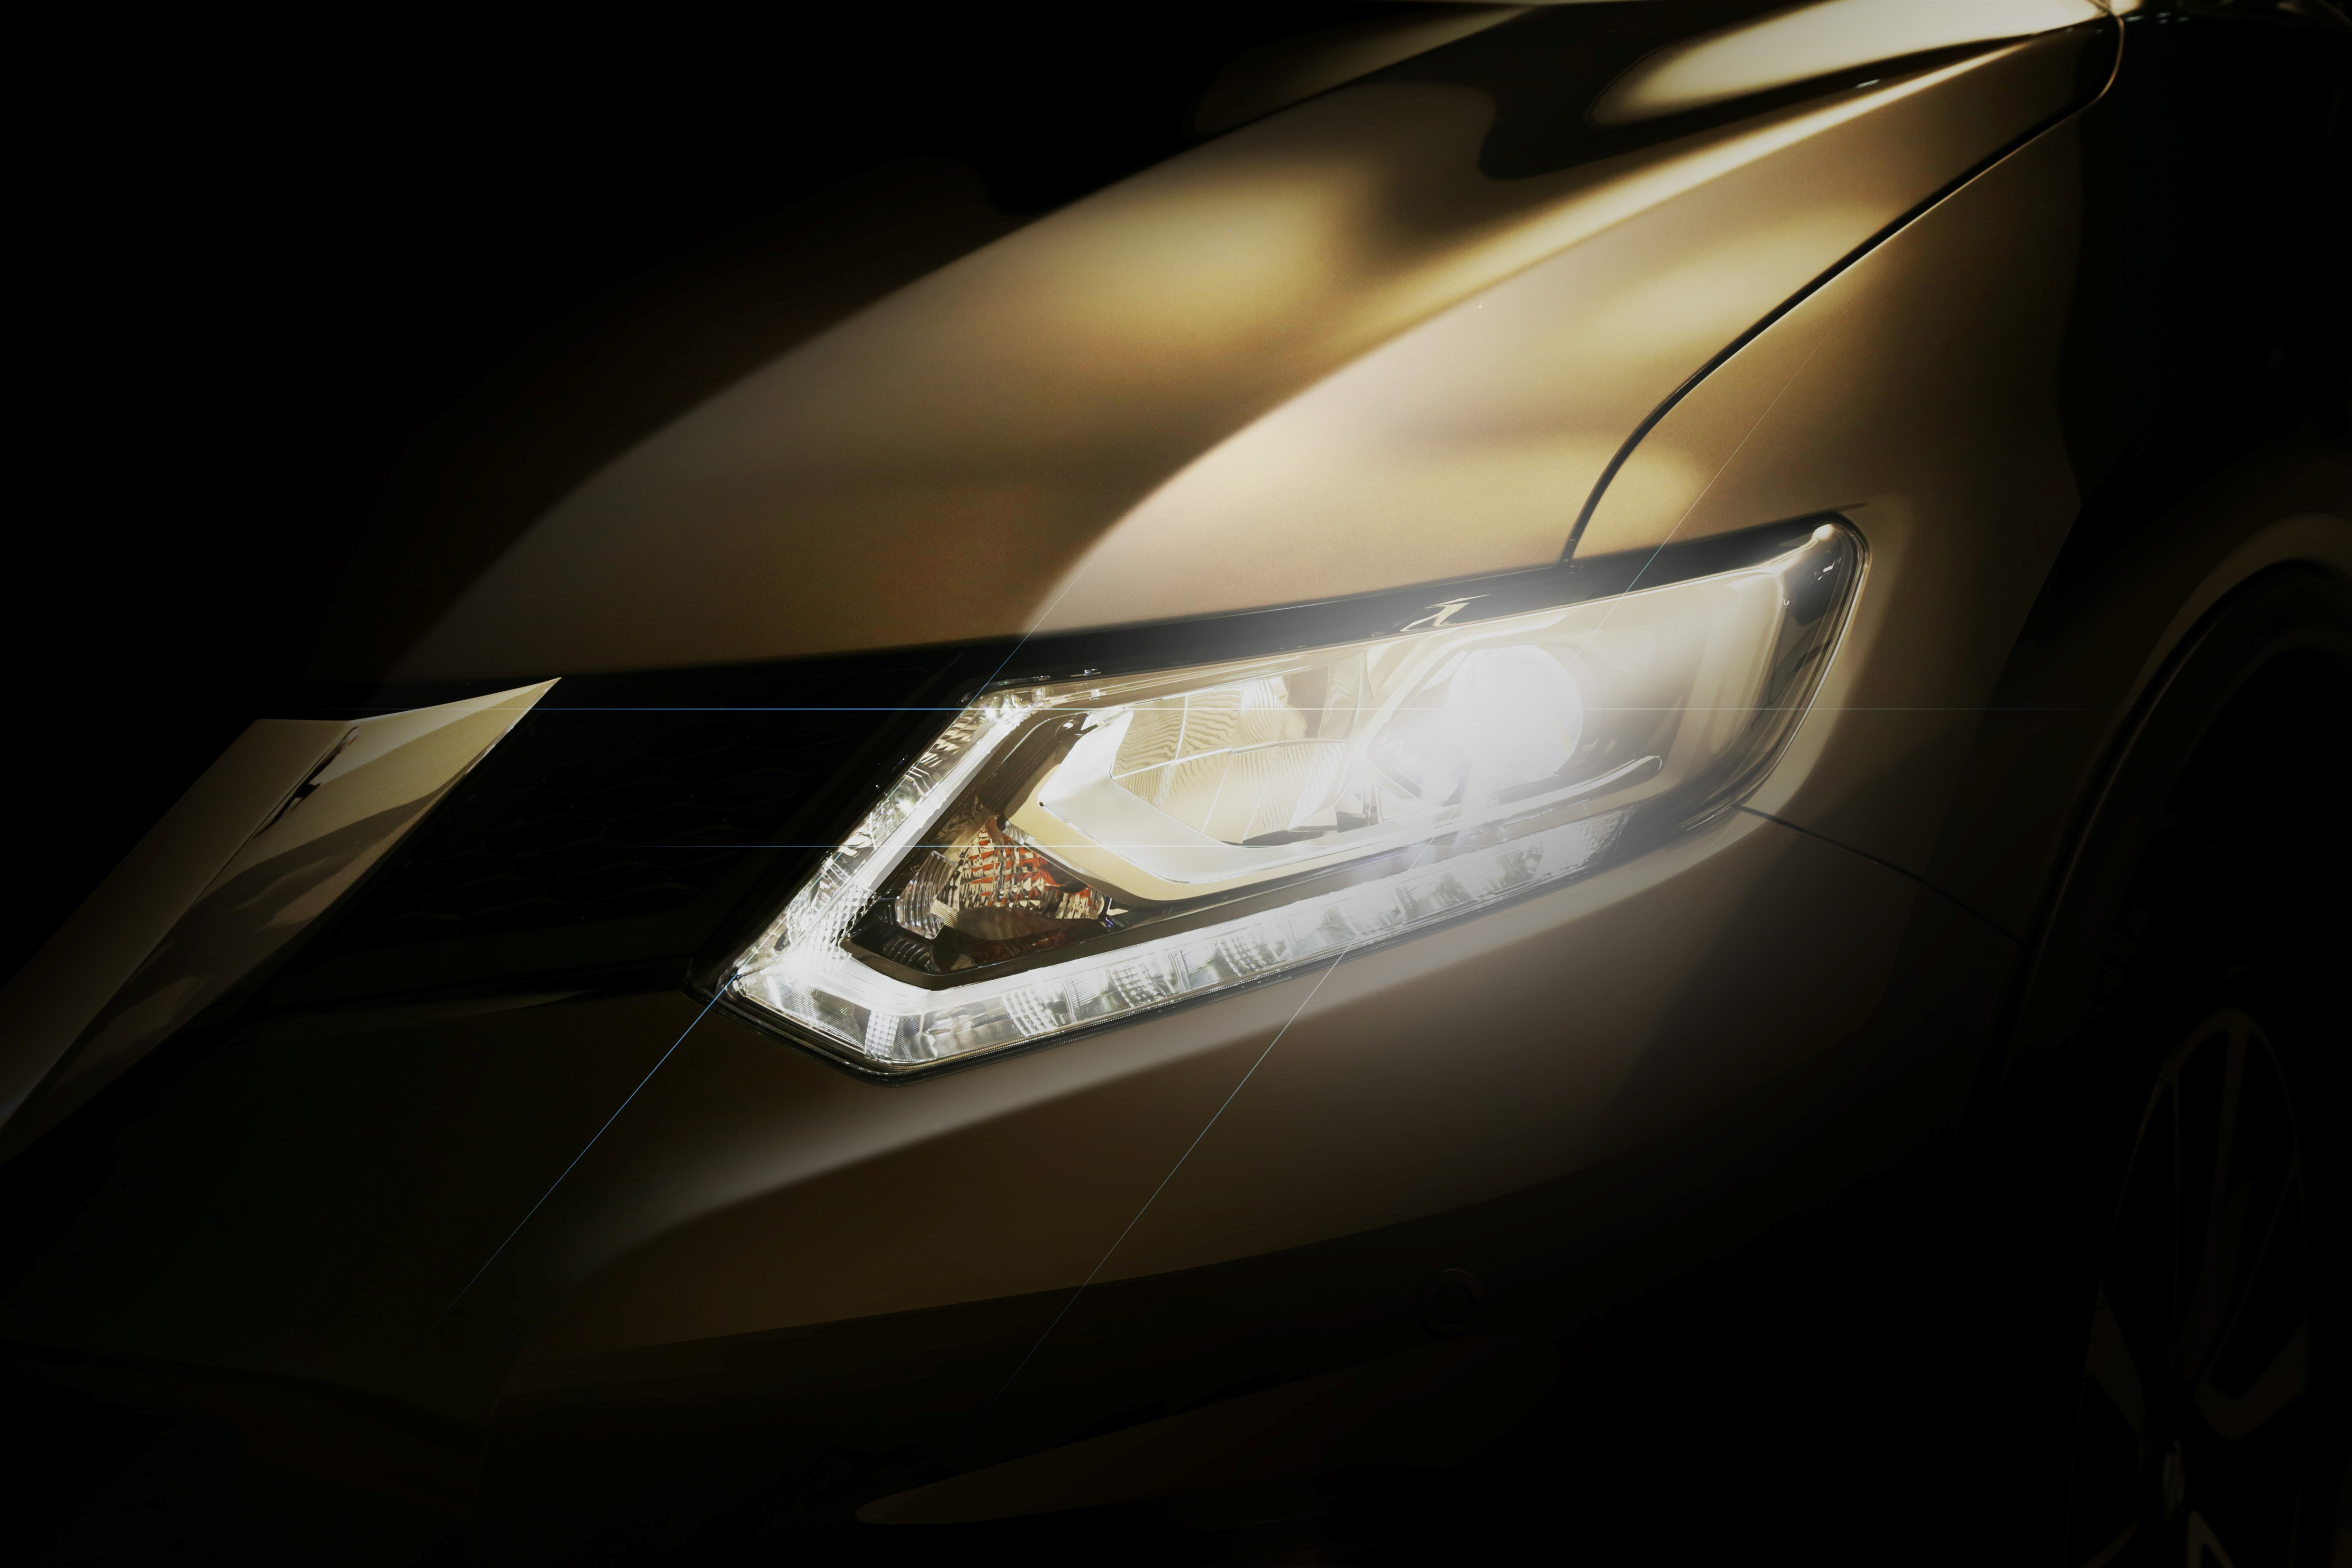 Atat avem pentru a ilustra revolutia Nissan...